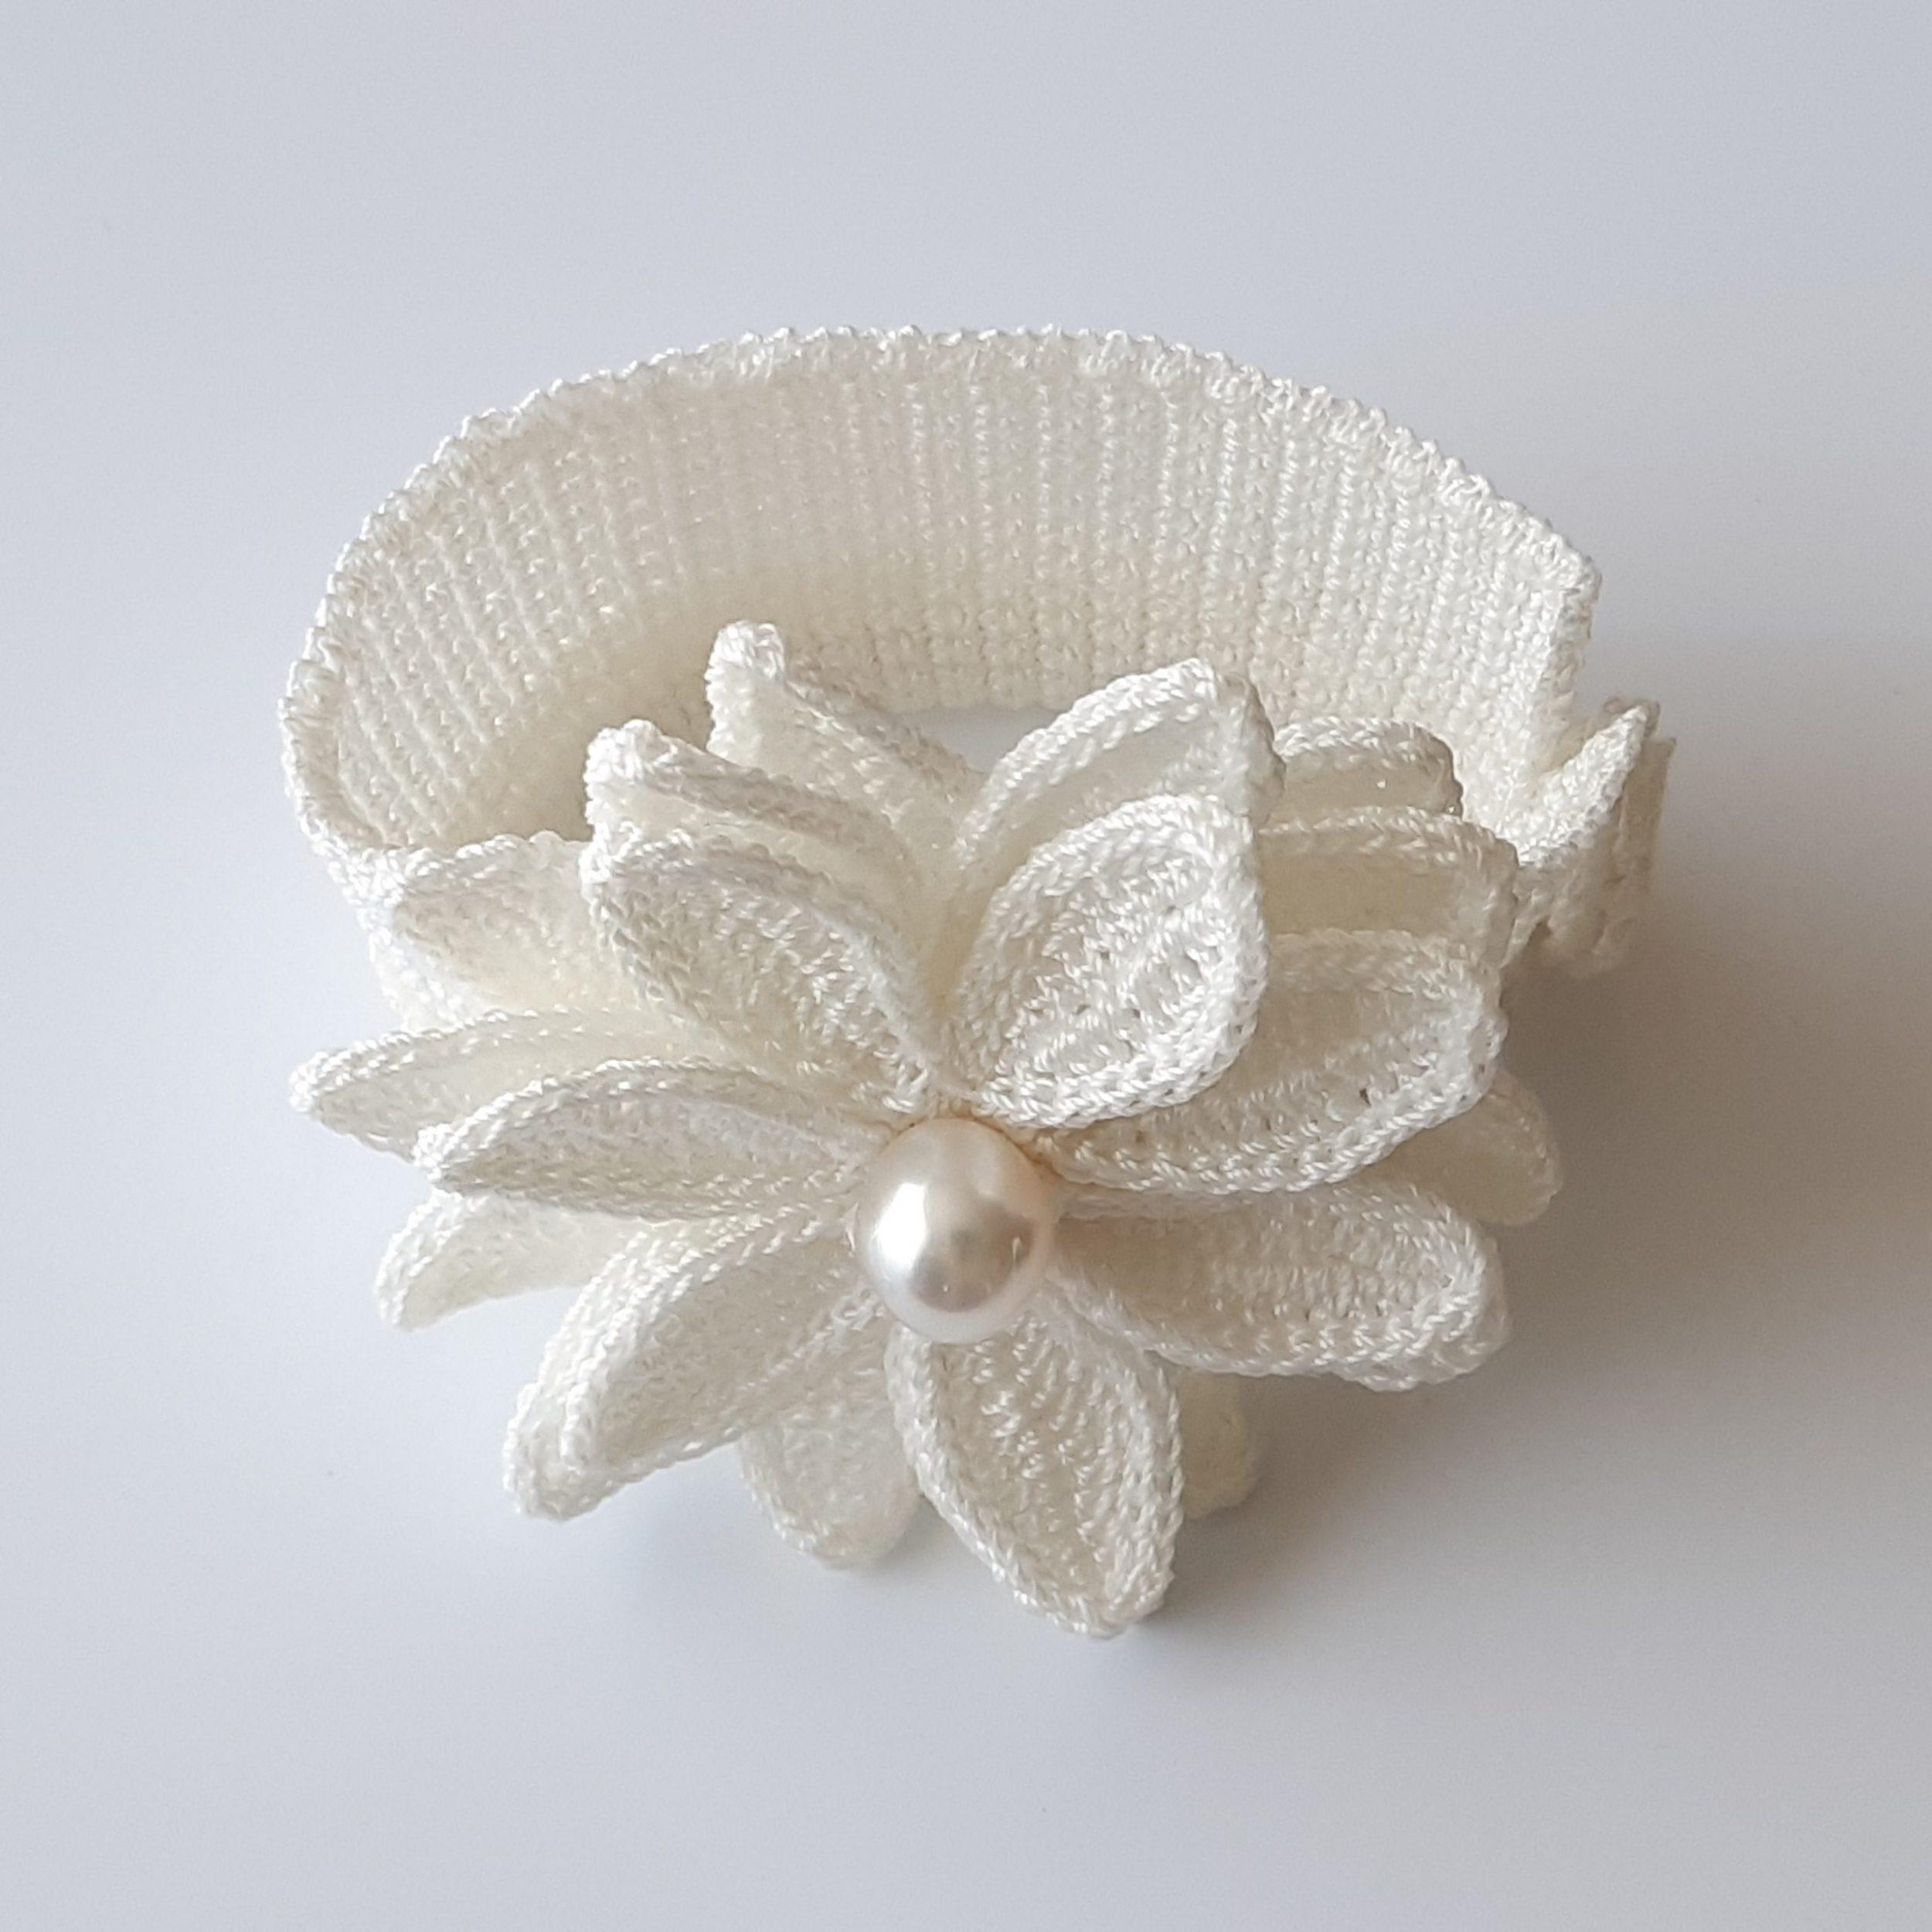 Brazalete de perla australiana y crochet (2)